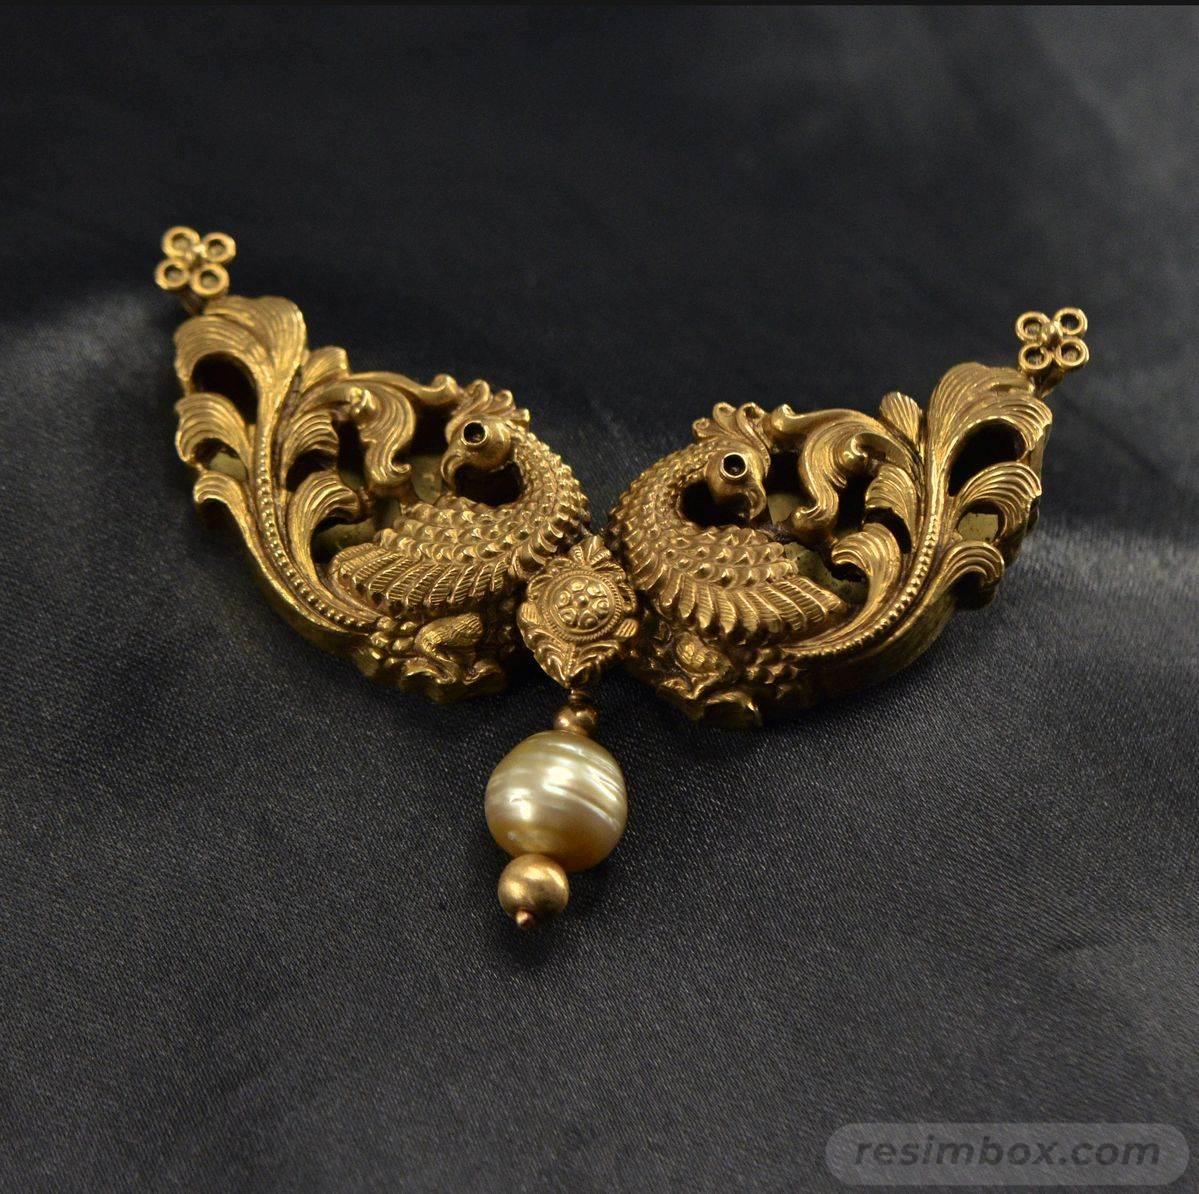 beautiful jewelry diy-696087686133603383